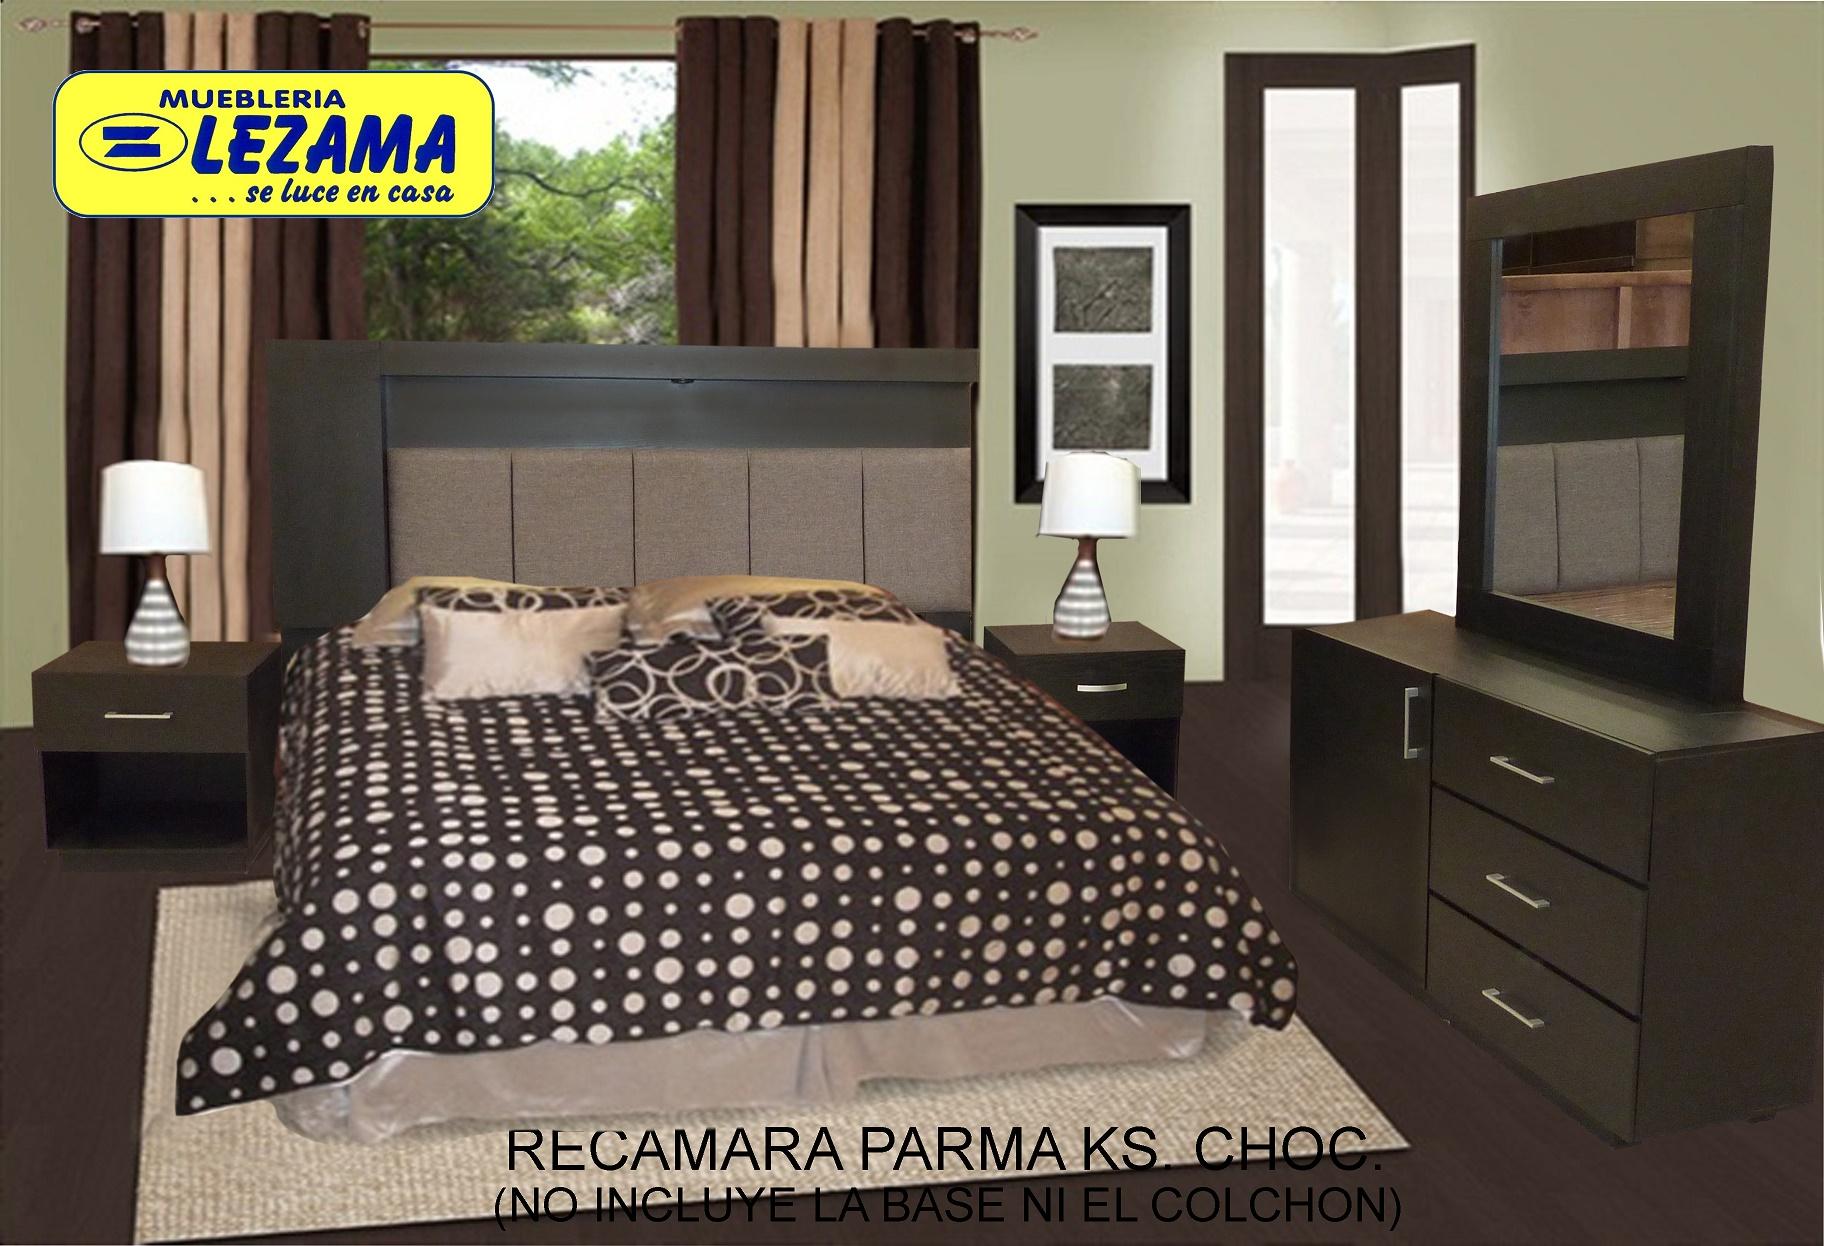 RECAMARA__PARMA_KS_CHOC_LISTA_-_copia.jpg